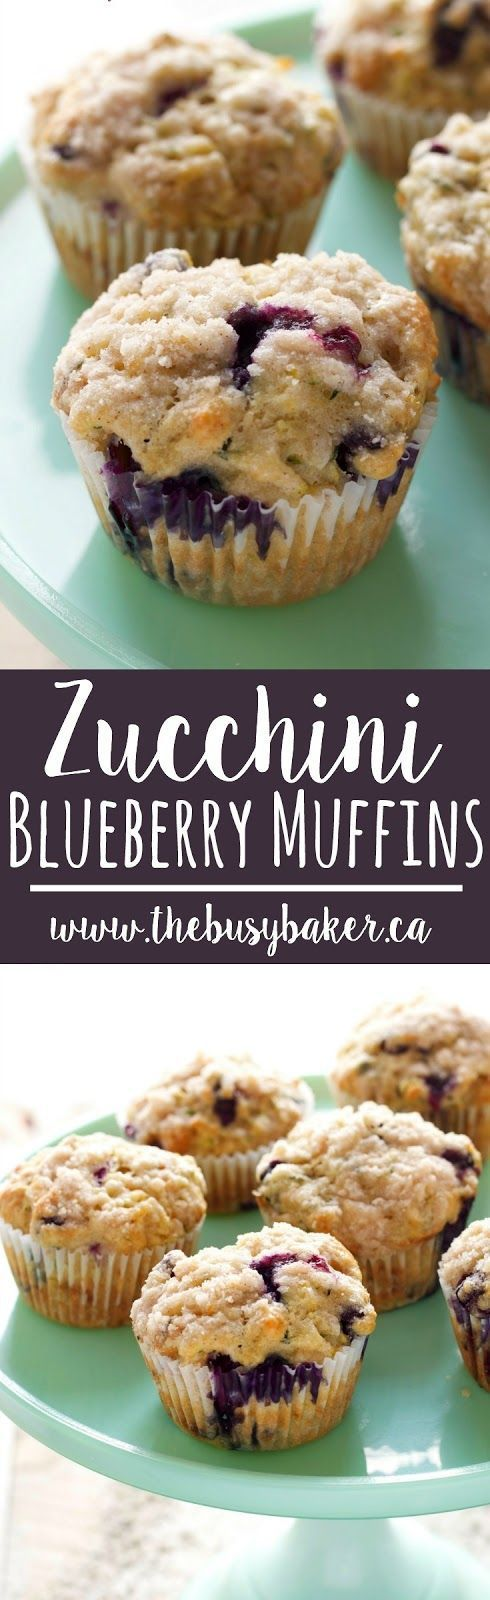 Zucchini Blueberry Muffins Recipe Blueberry zucchini